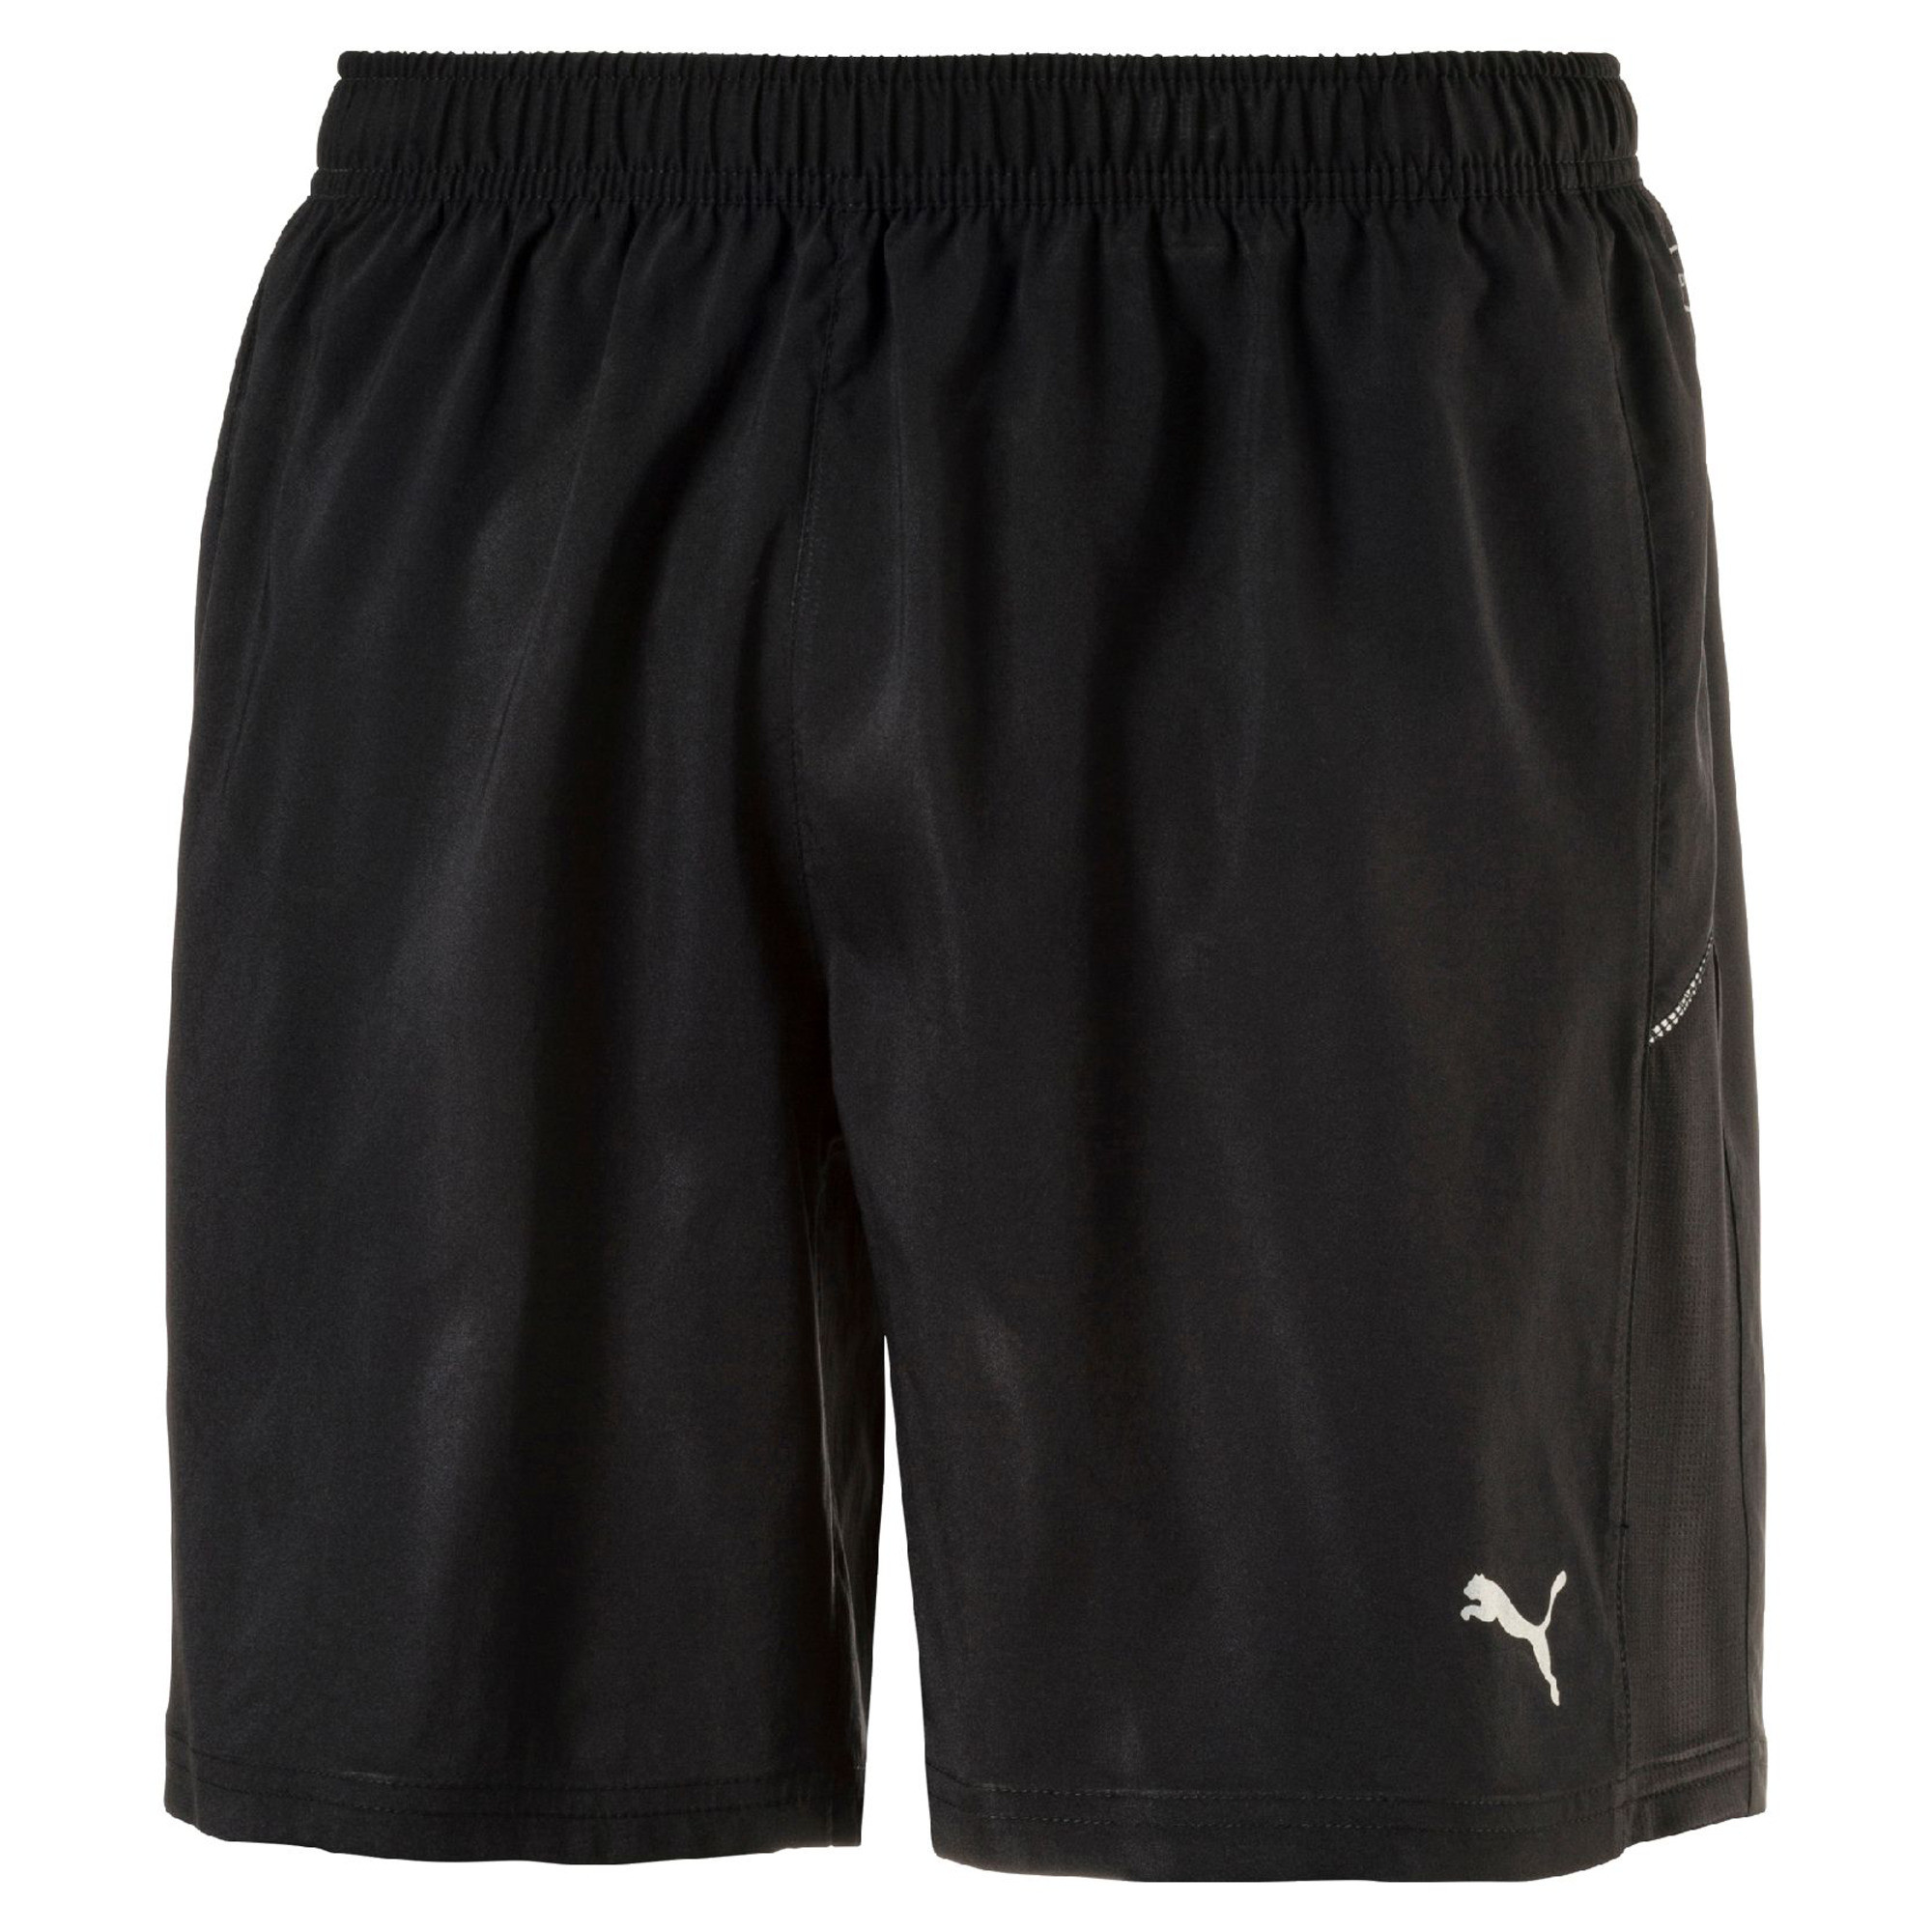 Image Puma Running Men's Shorts #1